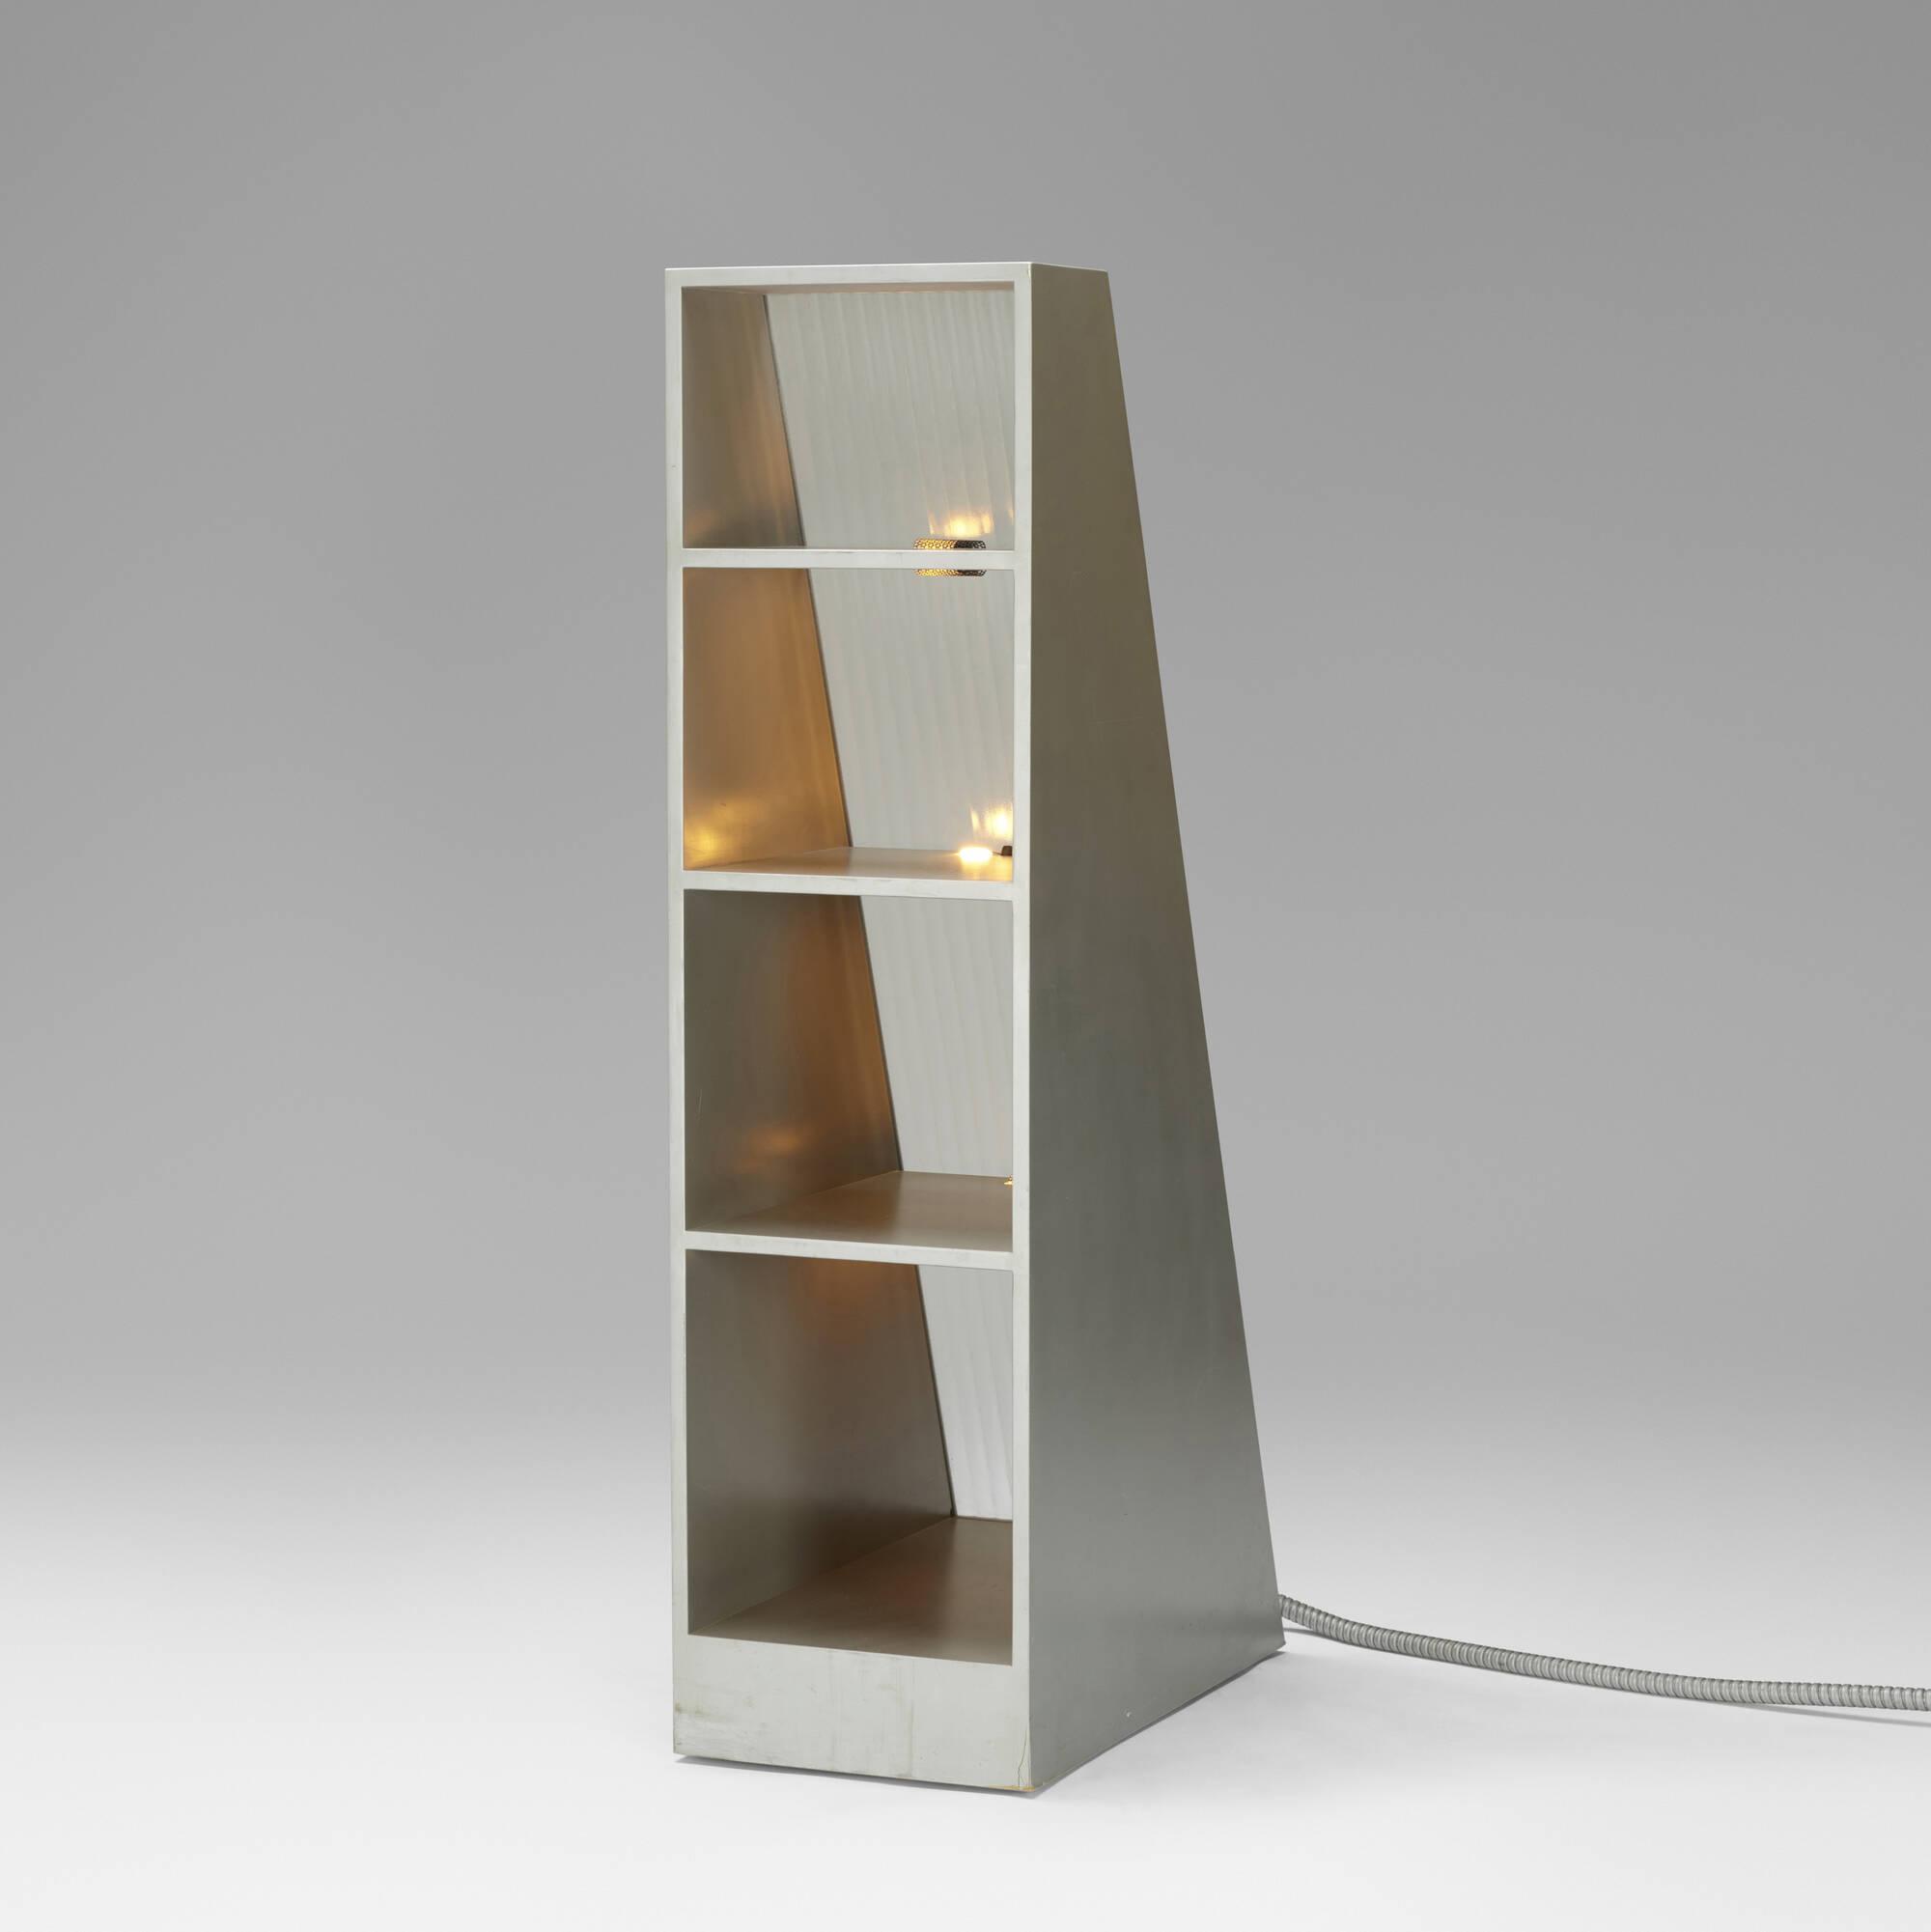 271: James Hong / Karnak illuminated bookcase (3 of 3)